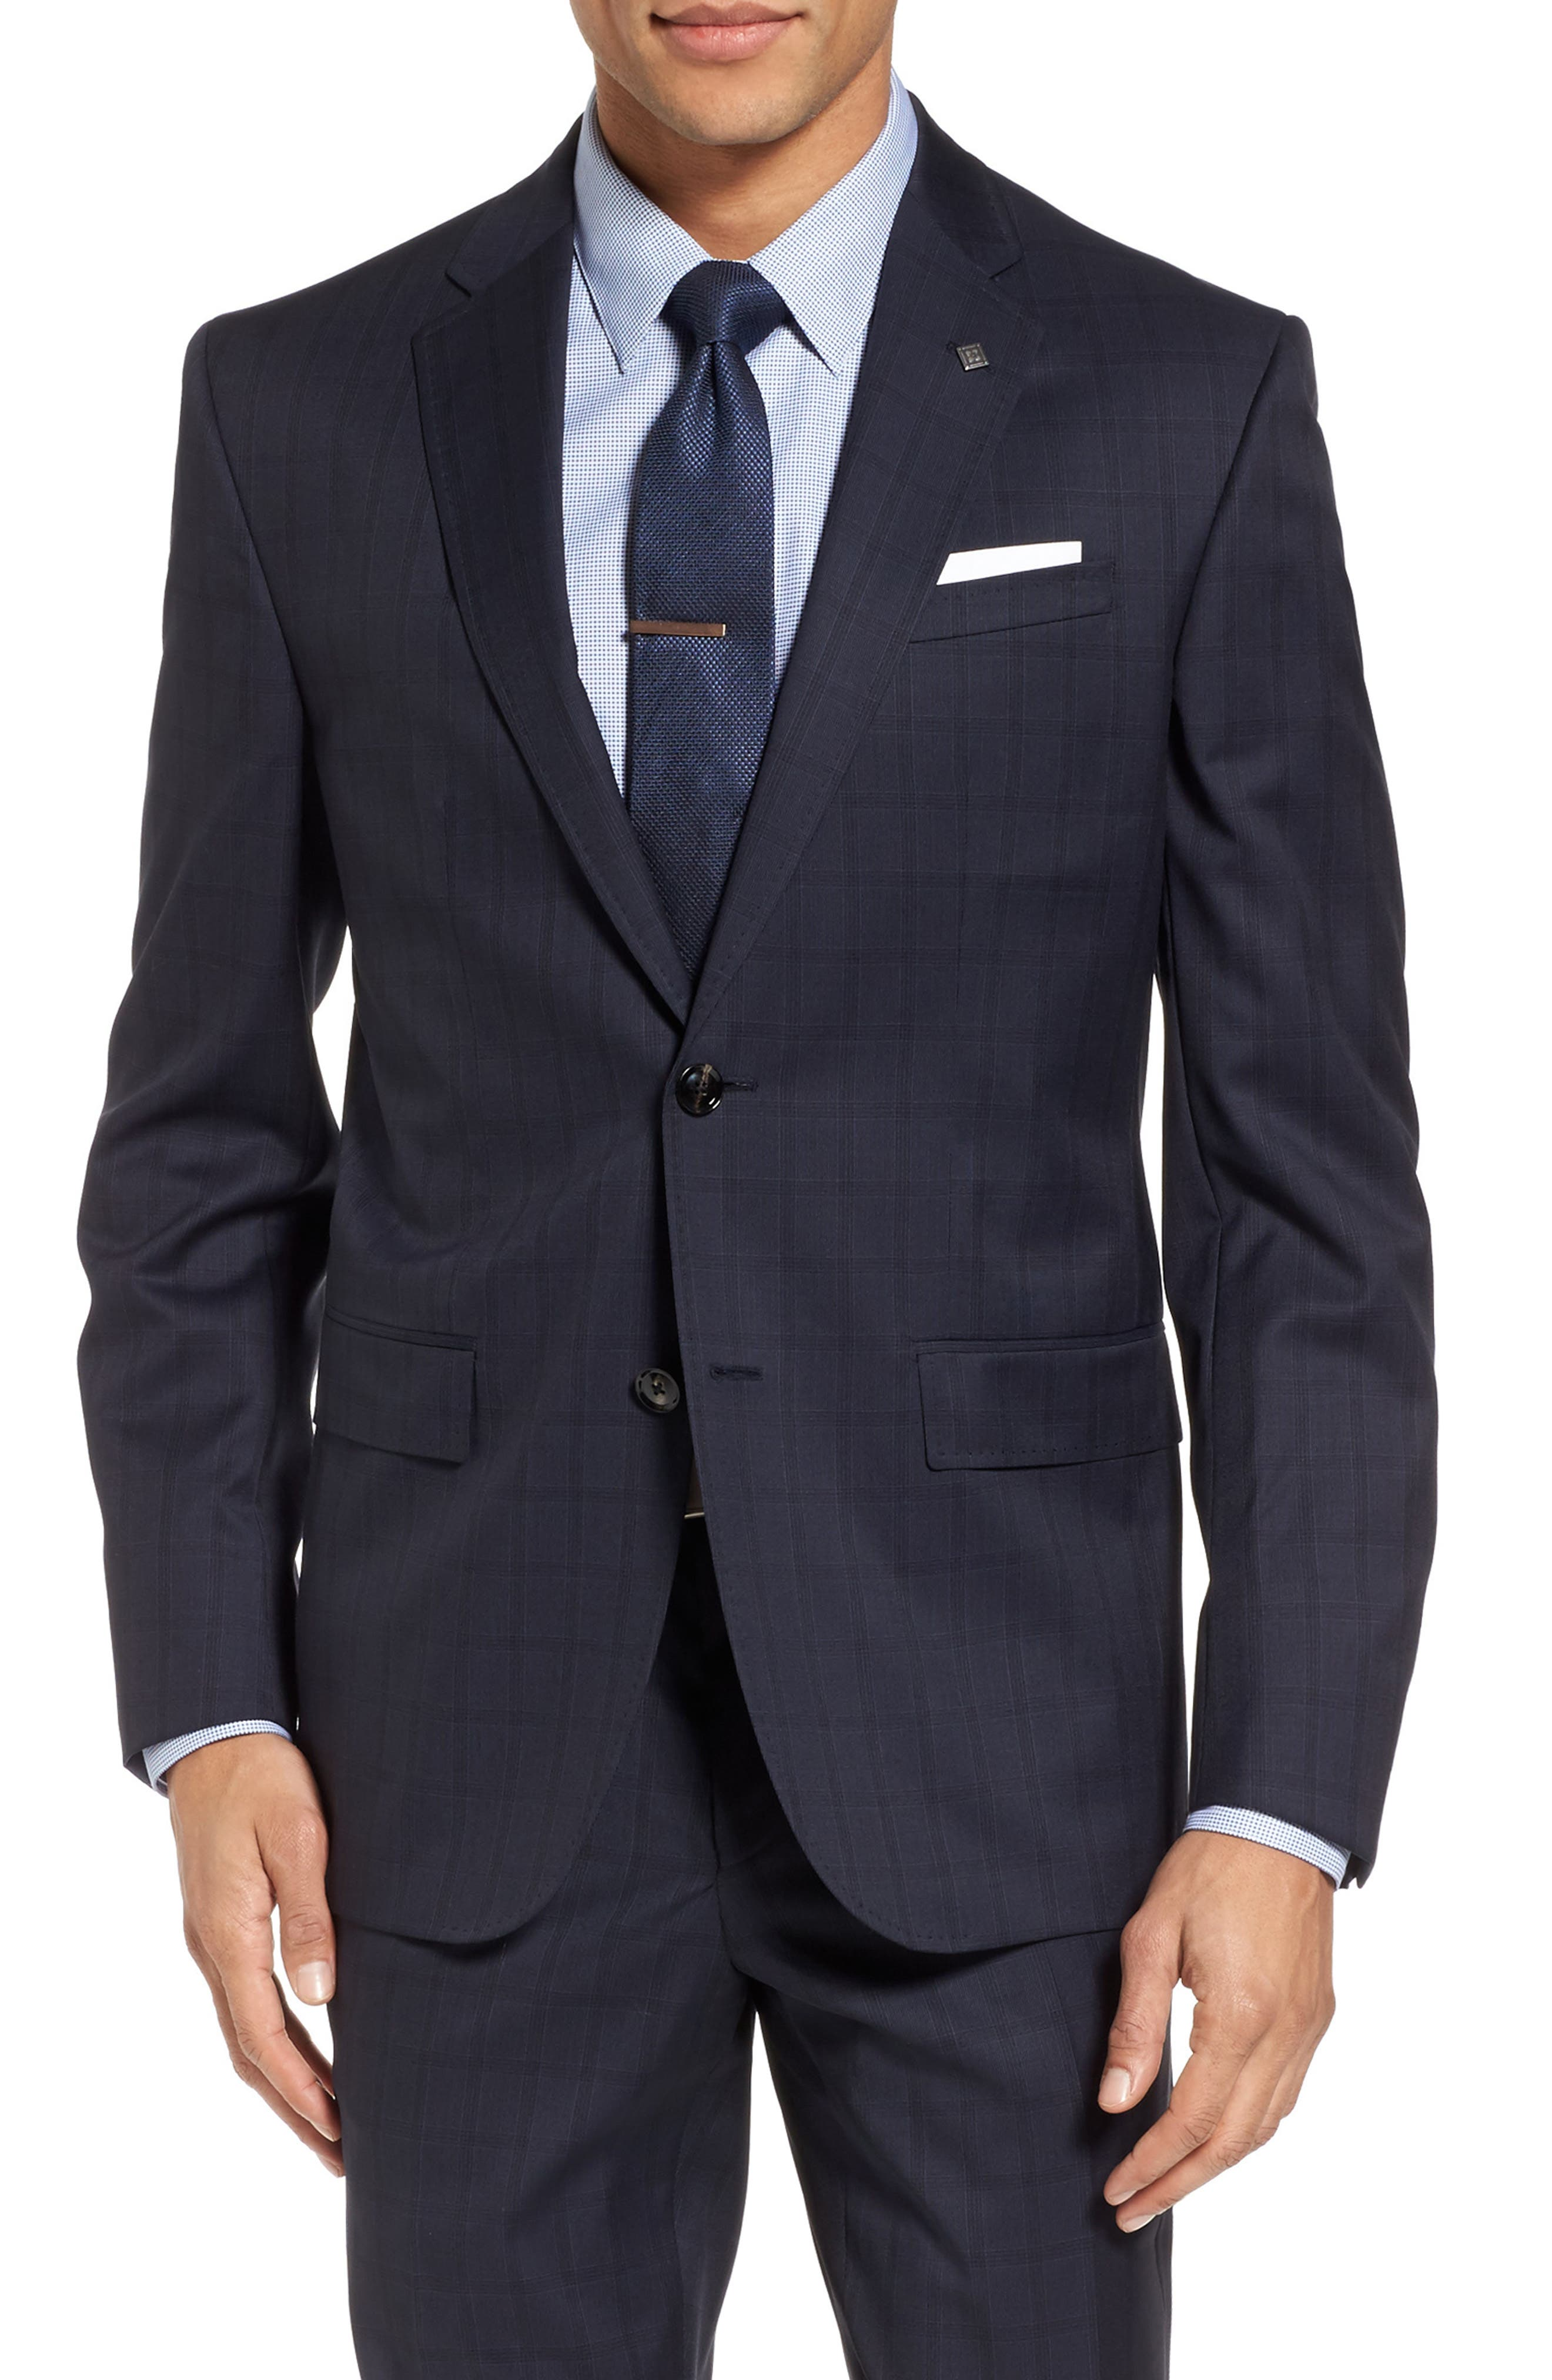 Jay Trim Fit Check Wool Suit,                             Alternate thumbnail 5, color,                             410